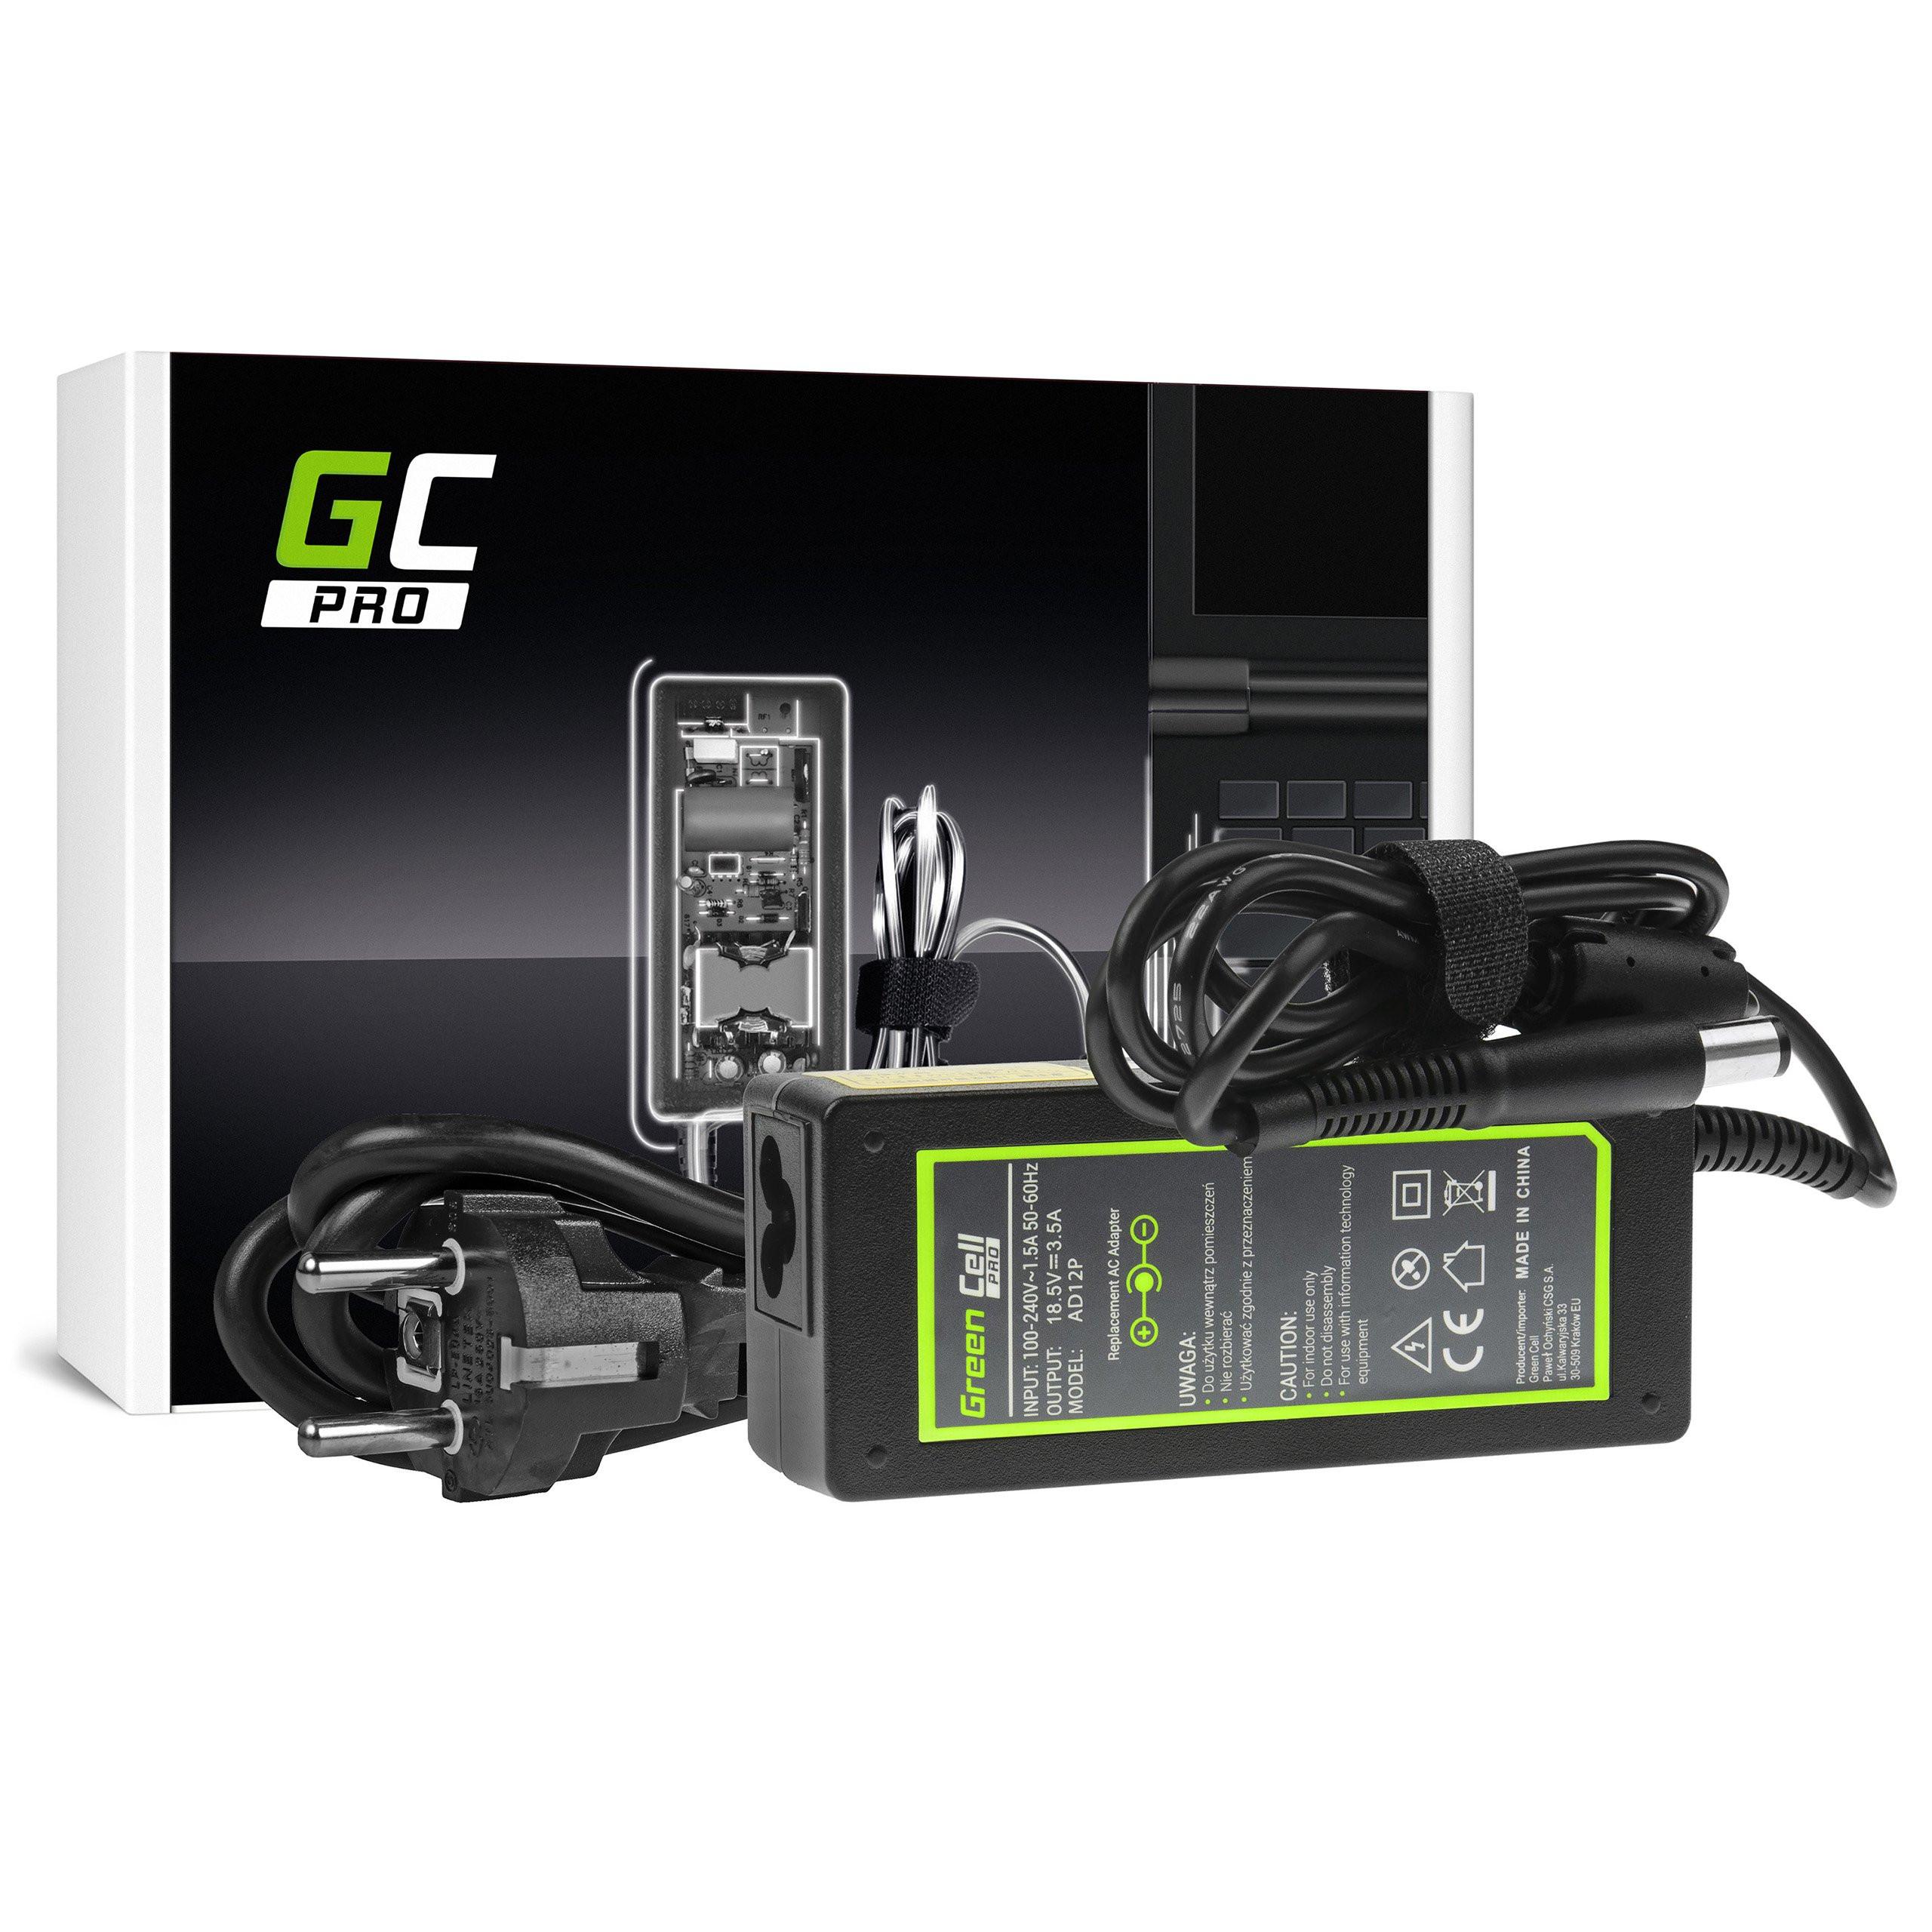 Zasilacz Ładowarka Green Cell PRO 18.5V 3.5A 65W do HP 250 G1 255 G1 ProBook 450 G2 455 G2 Compaq Presario CQ56 CQ57 CQ58 CQ60